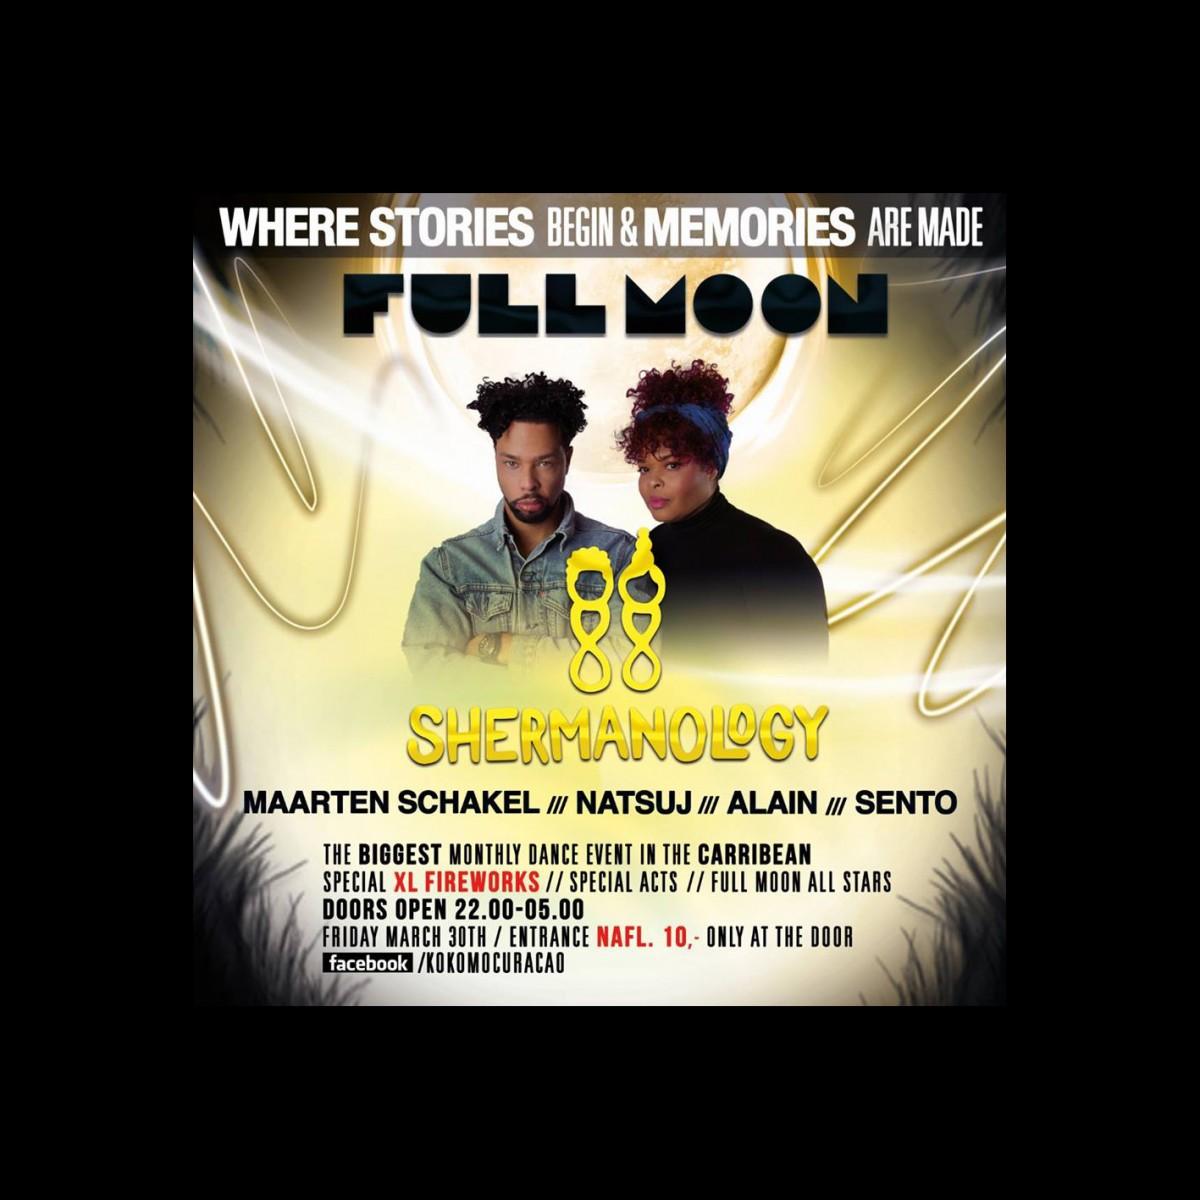 Kokomo Beach Curacao Presents: Full Moon Party